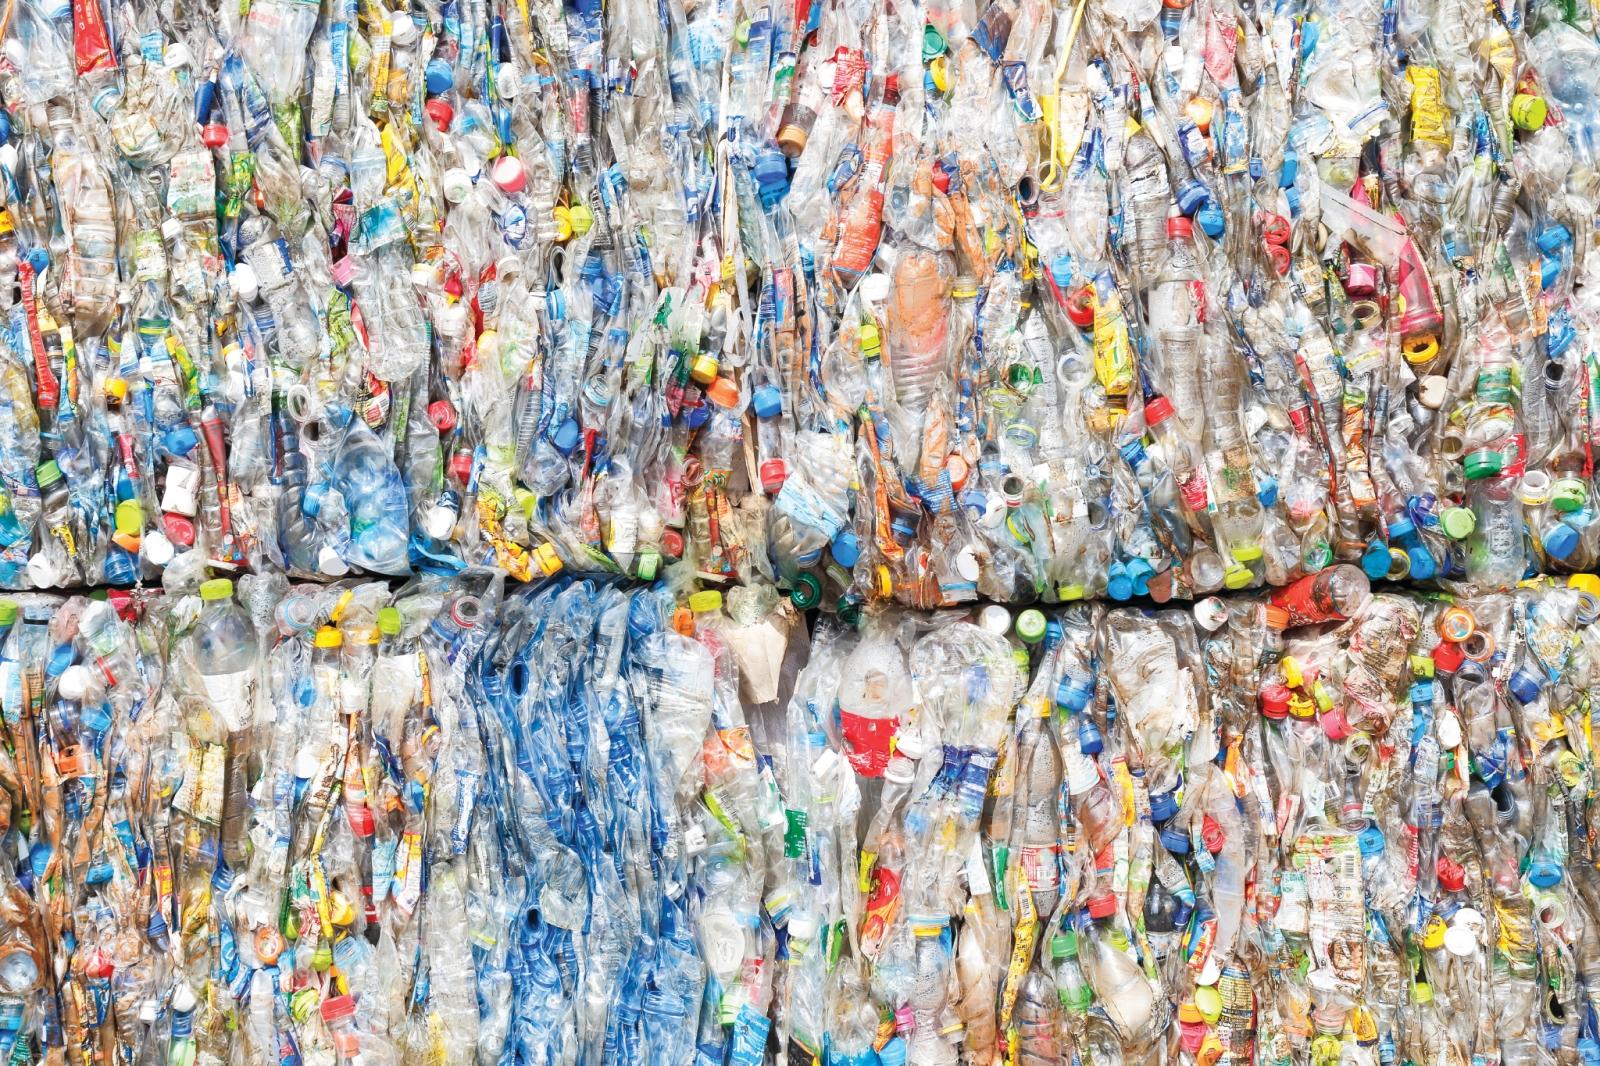 Figure 1: Bottle Pet Plastic (Photo by Warut Chinsai, via Shutterstock)